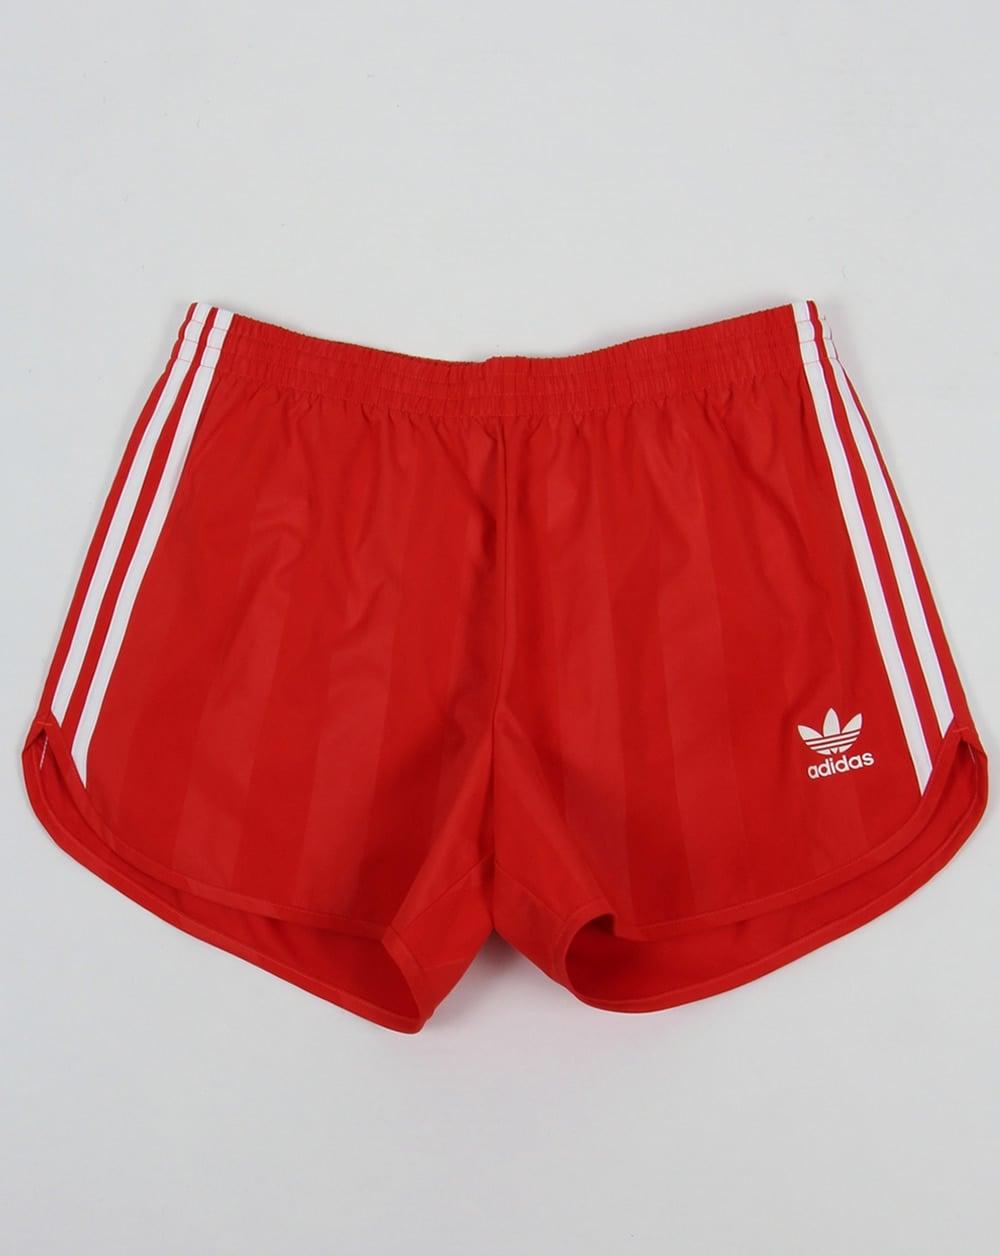 Adidas Originals Football Shorts Red - Adidas Originals from 80s ...